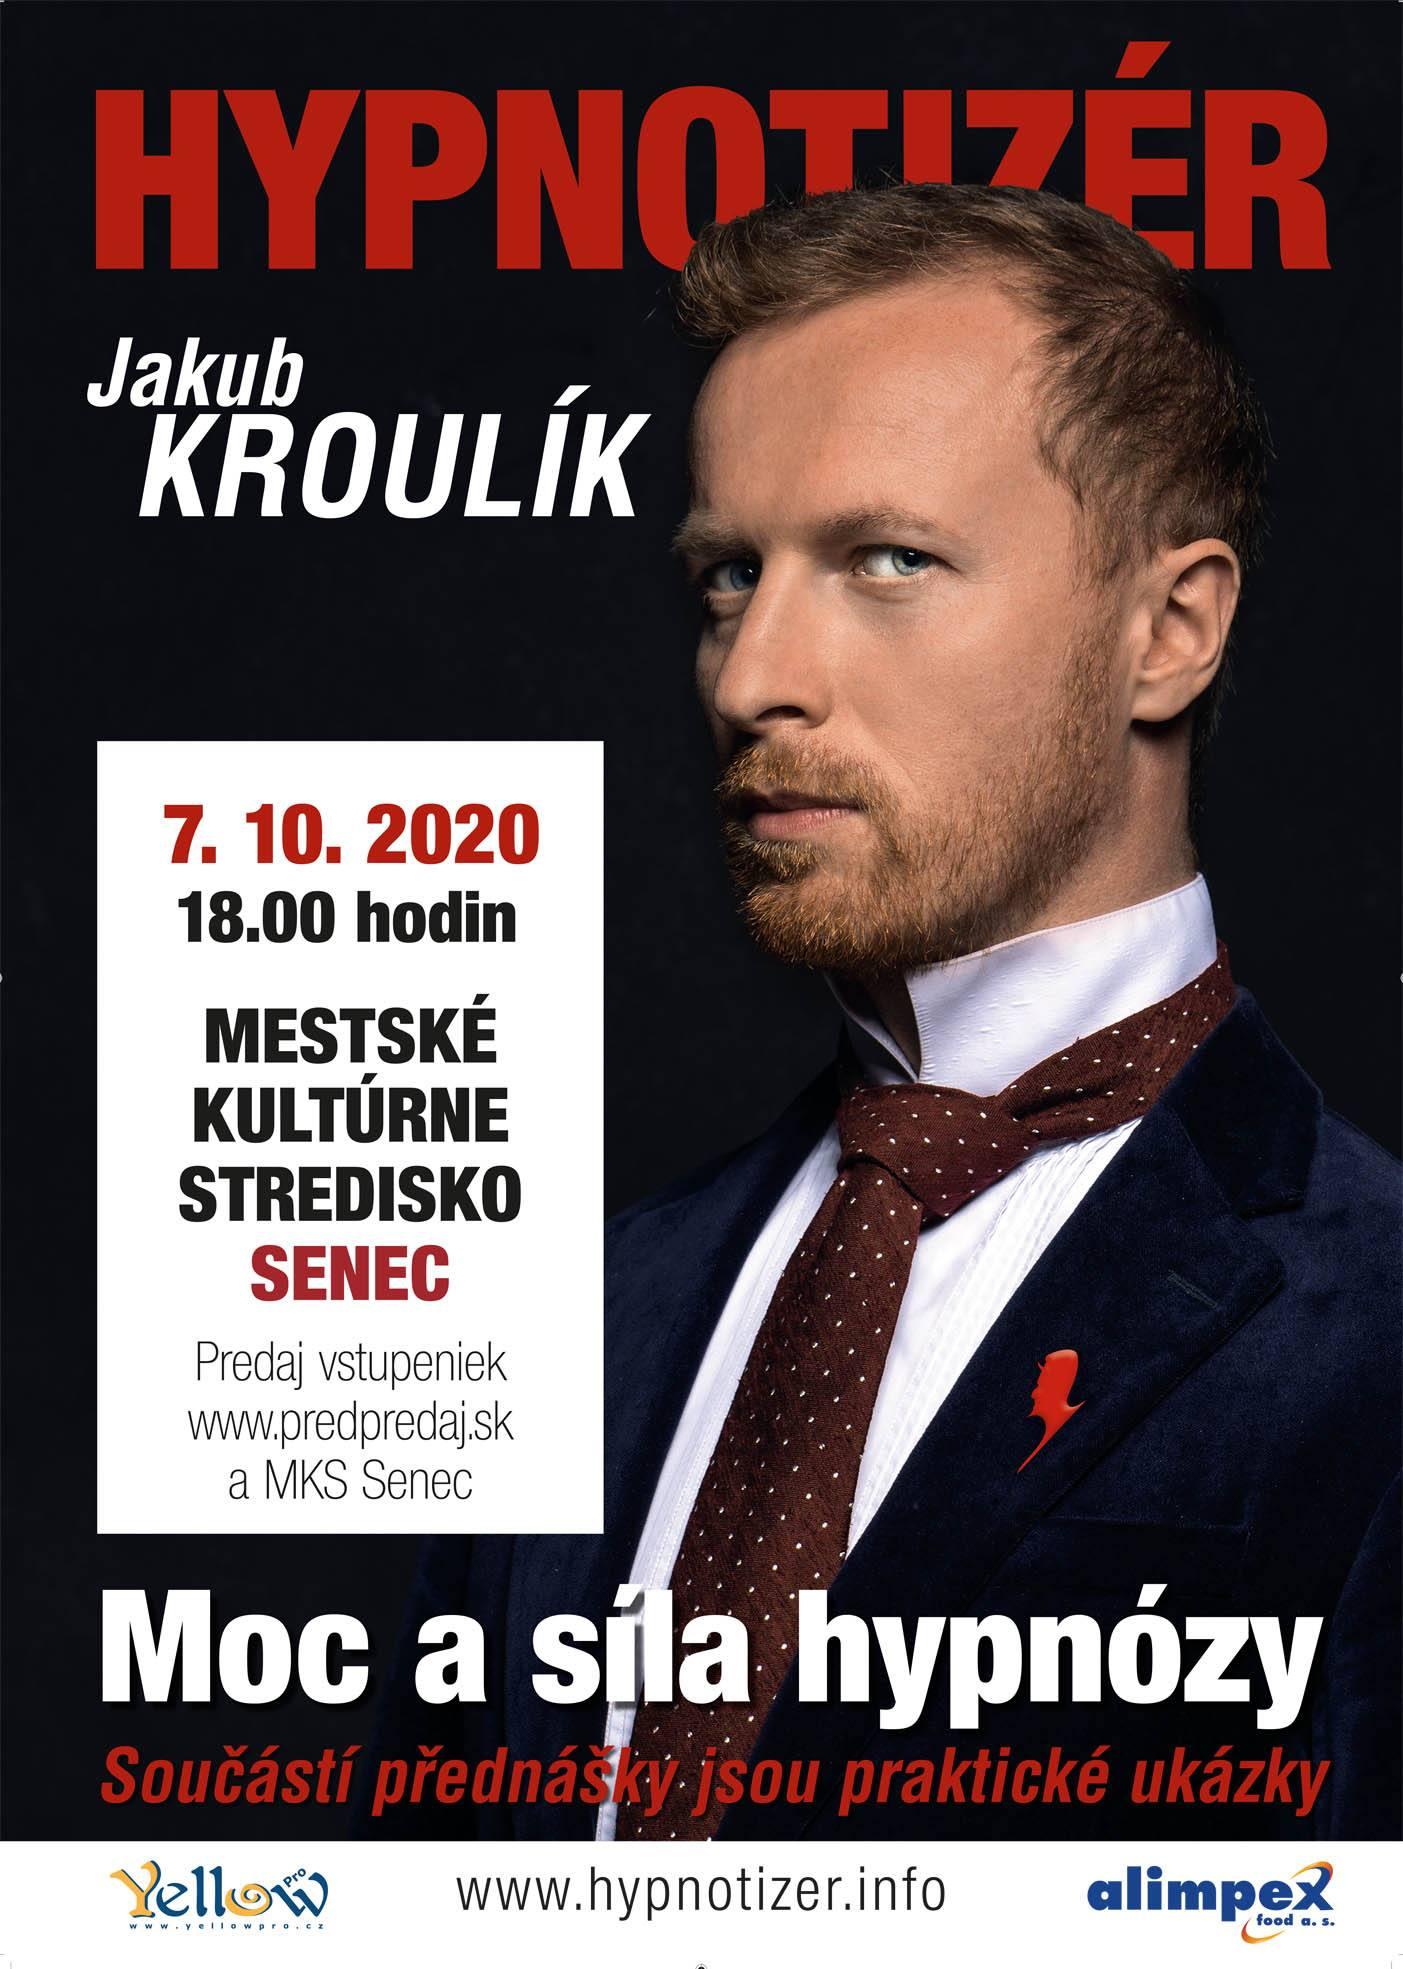 Hypnotizer Jakub Kroulik - Senec 2020